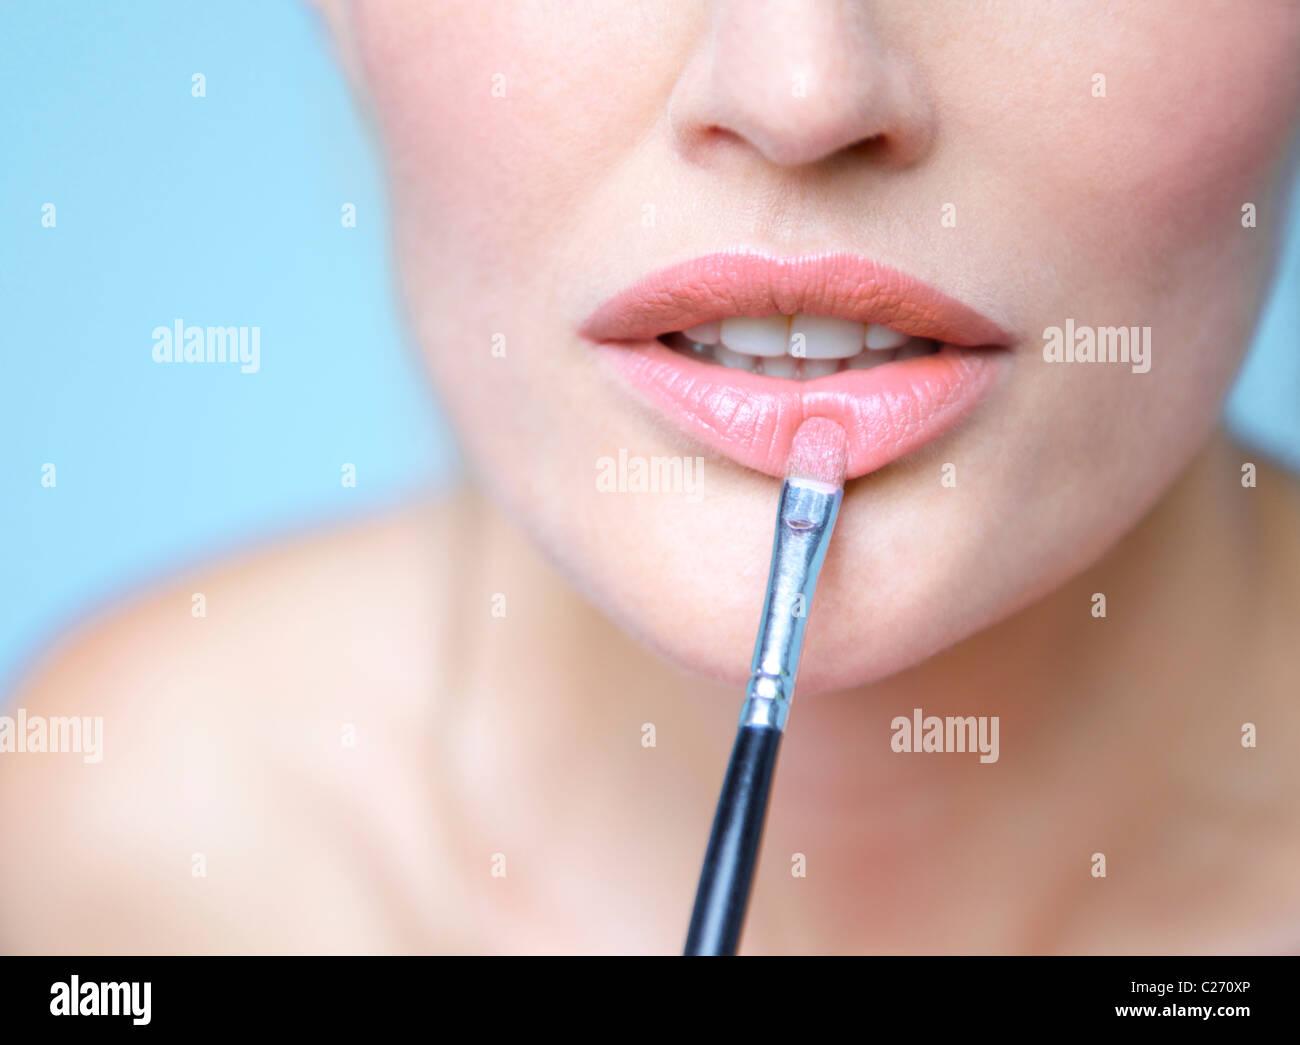 Frau Anwendung Lippenstift mit Make-up Pinsel - Nahaufnahme Stockfoto